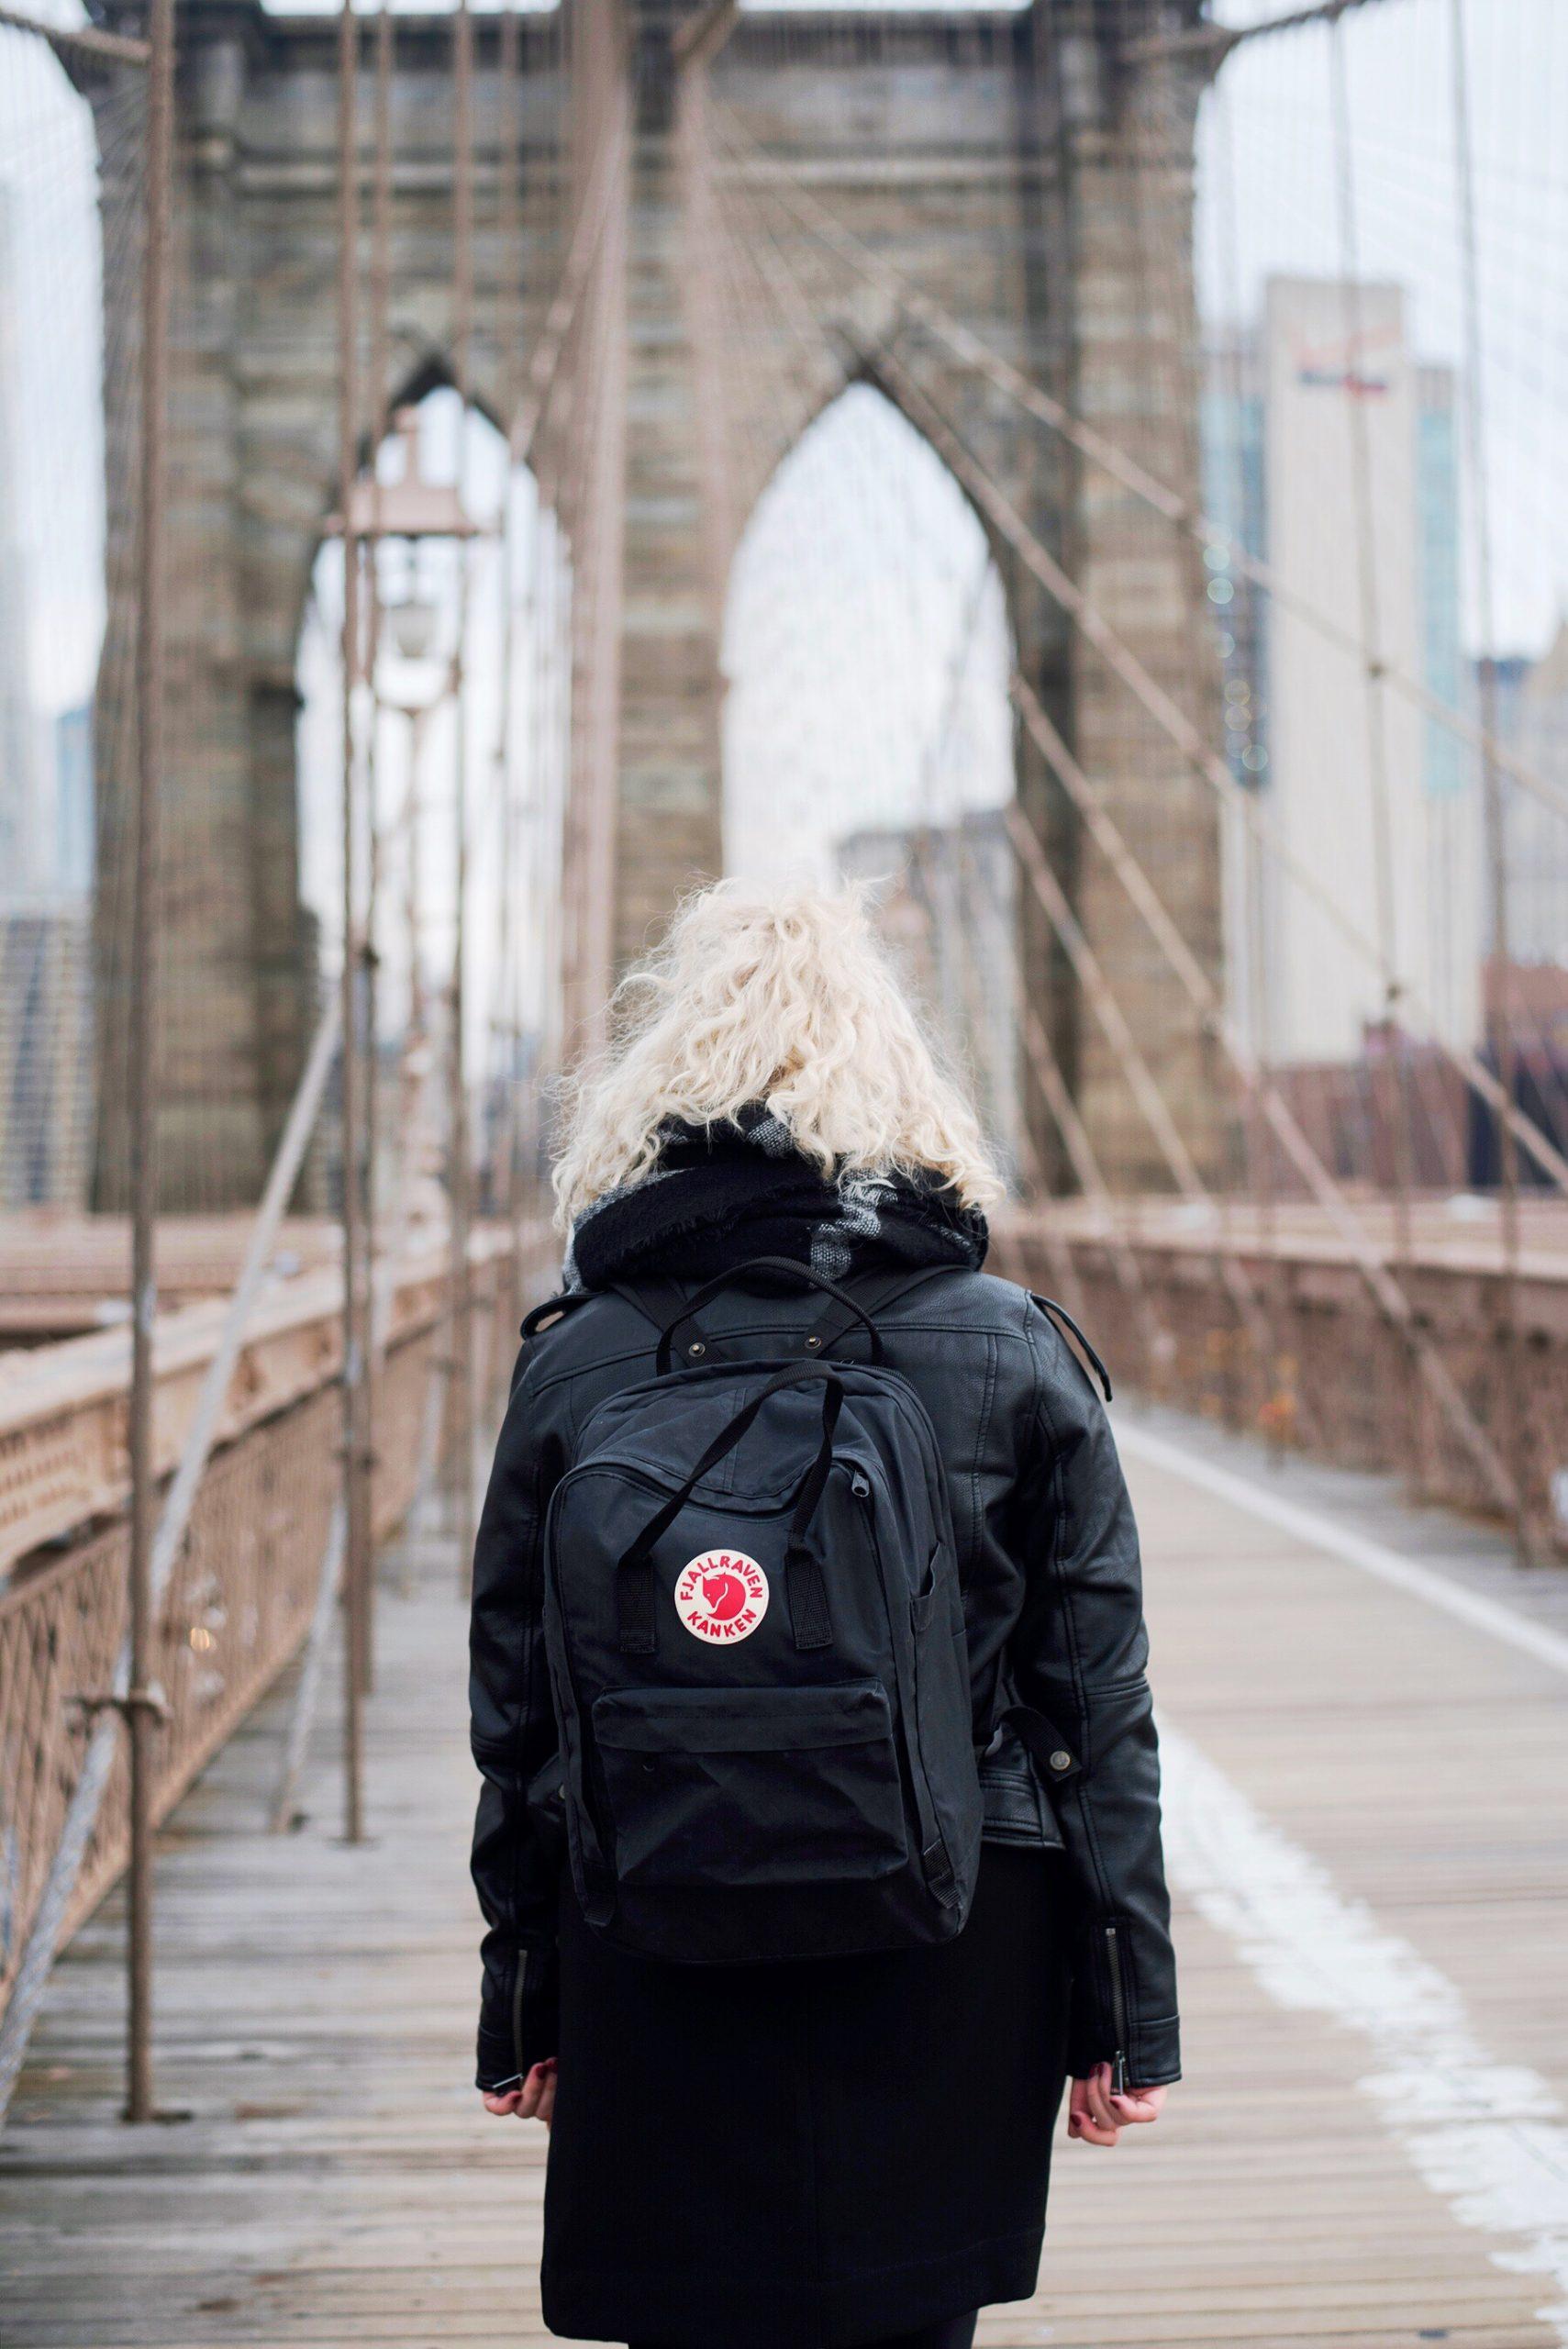 Fjallraven black laptop backpack camera bag on the Brooklyn Bridge